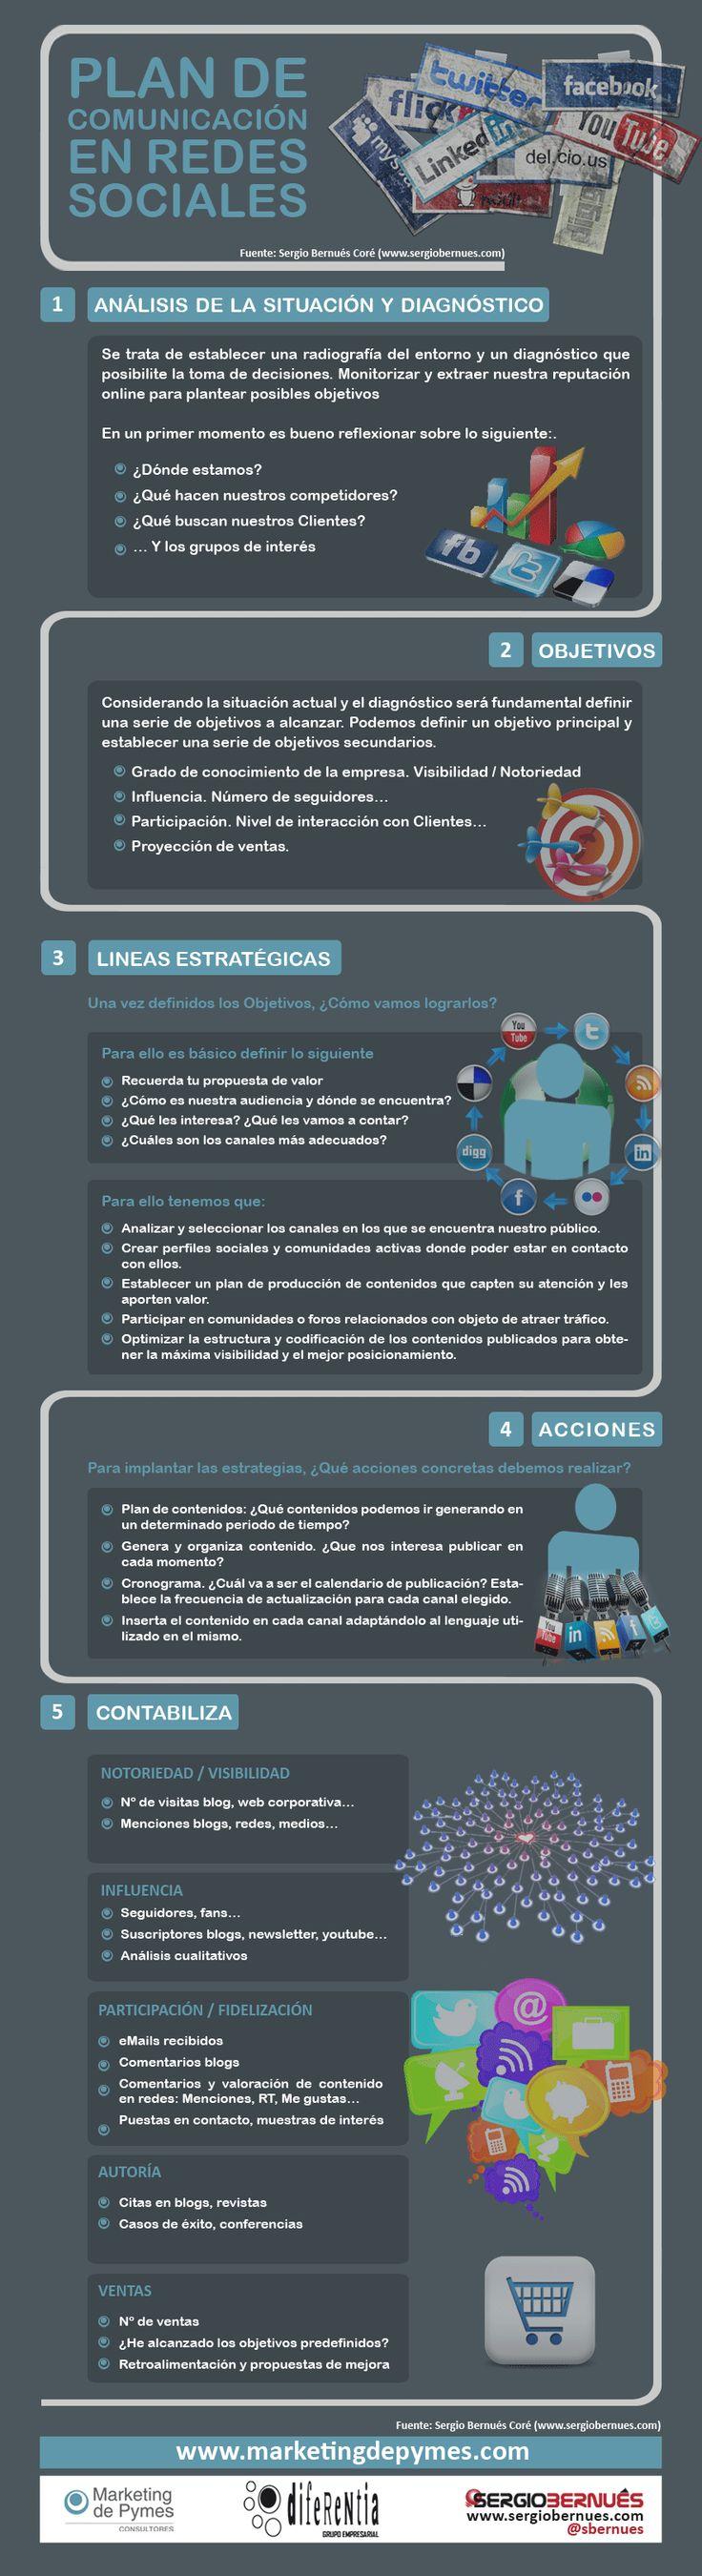 Así se elabora un Plan Social Media (+Infografía)   Eska Comunicaciones C.A